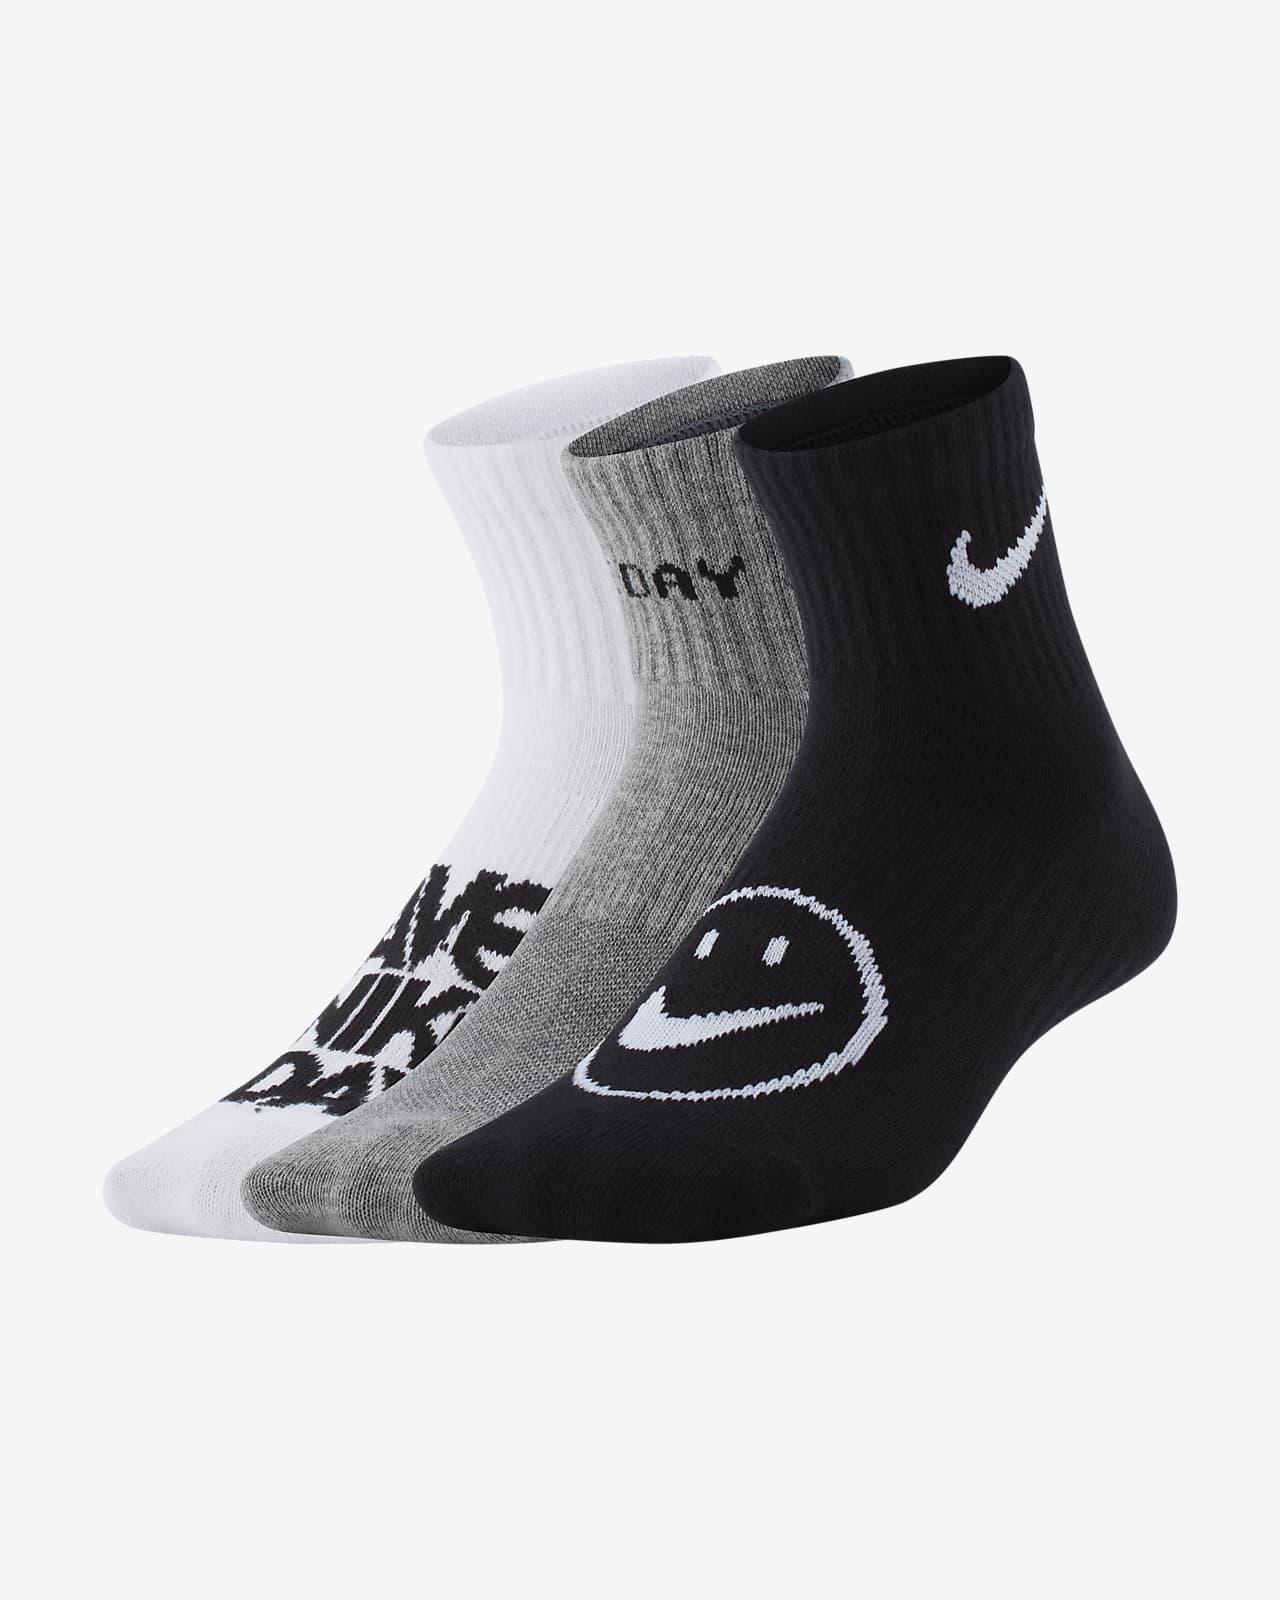 Nike Everyday Older Kids' Lightweight Ankle Socks (3 Pairs)